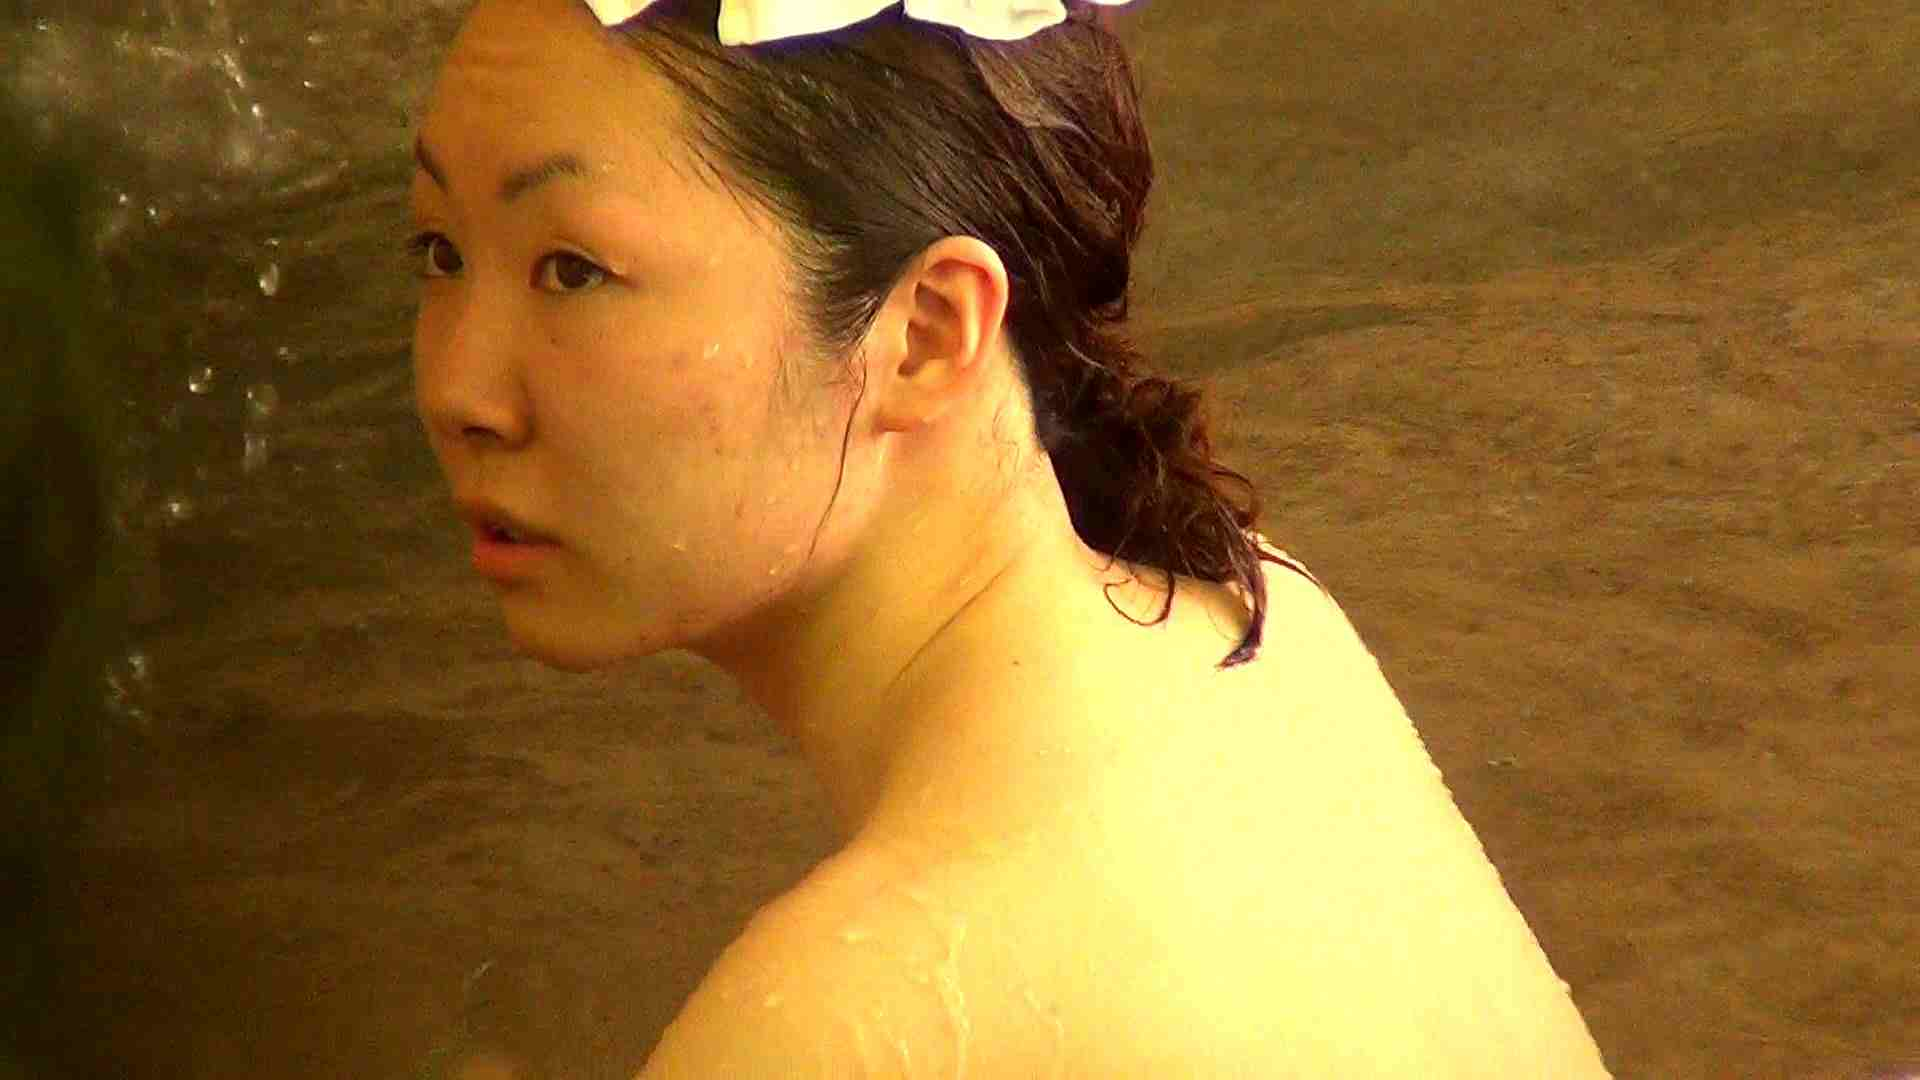 Aquaな露天風呂Vol.268 盗撮   OLセックス  107画像 49